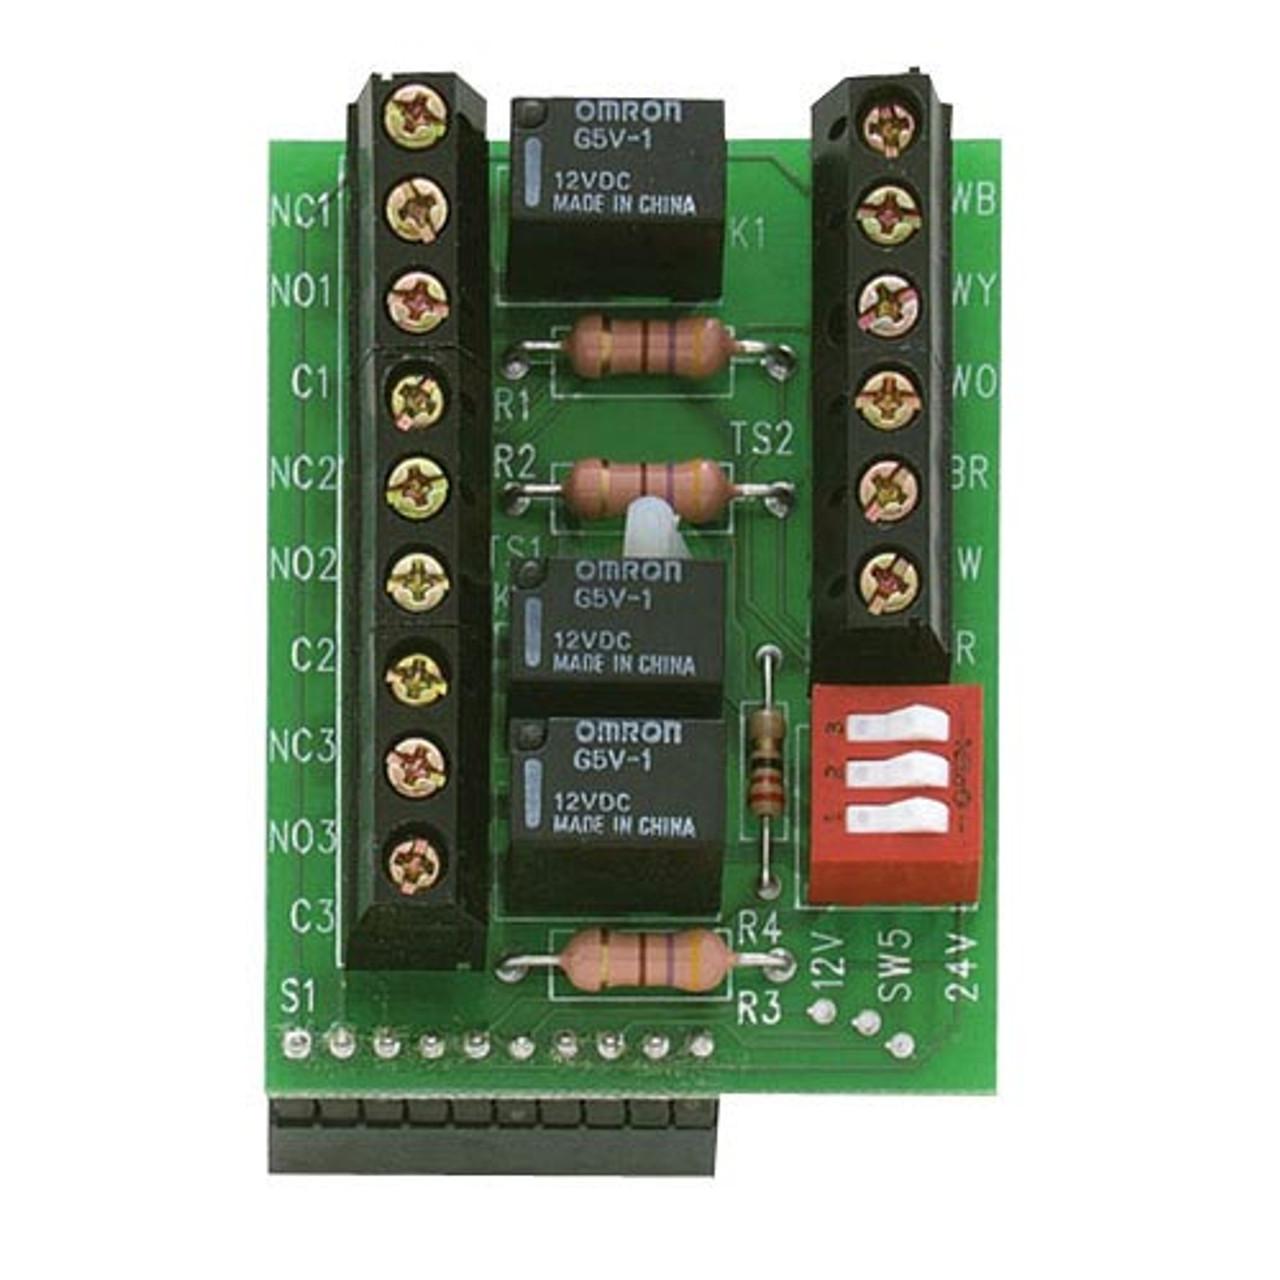 IEI-293 IEI Stand-Alone Access Control Relay Board